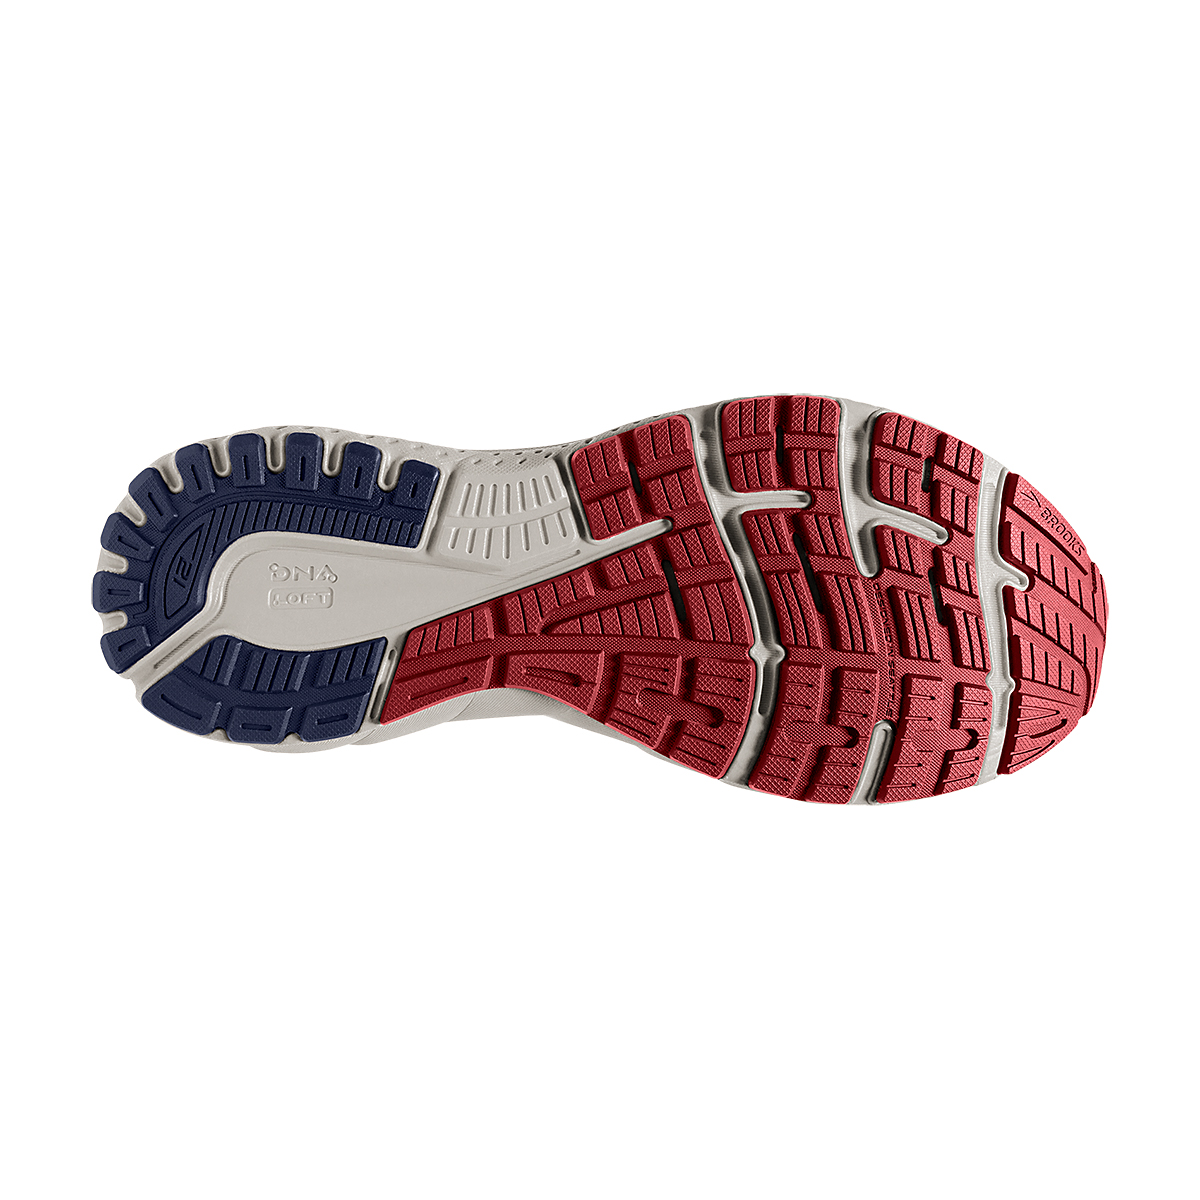 Men's Brooks Adrenaline GTS 21 Running Shoe - Color: Peacoat/Grey/Red - Size: 7 - Width: Regular, Peacoat/Grey/Red, large, image 3